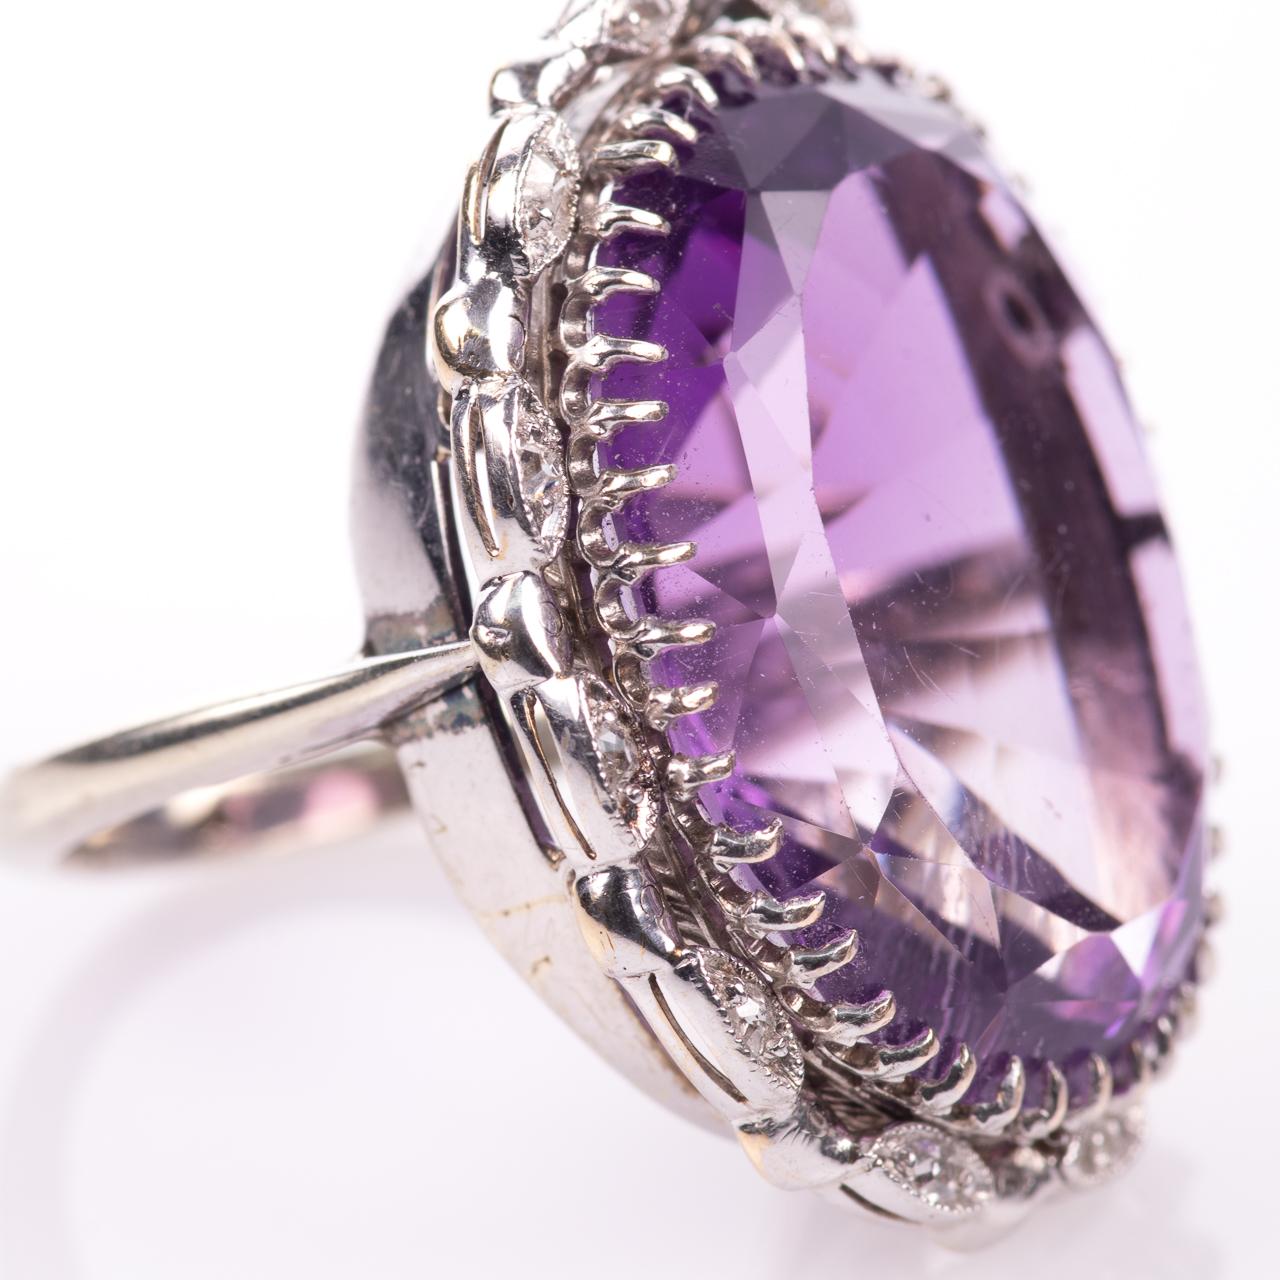 30ct Amethyst & Diamond Ring - Image 6 of 6